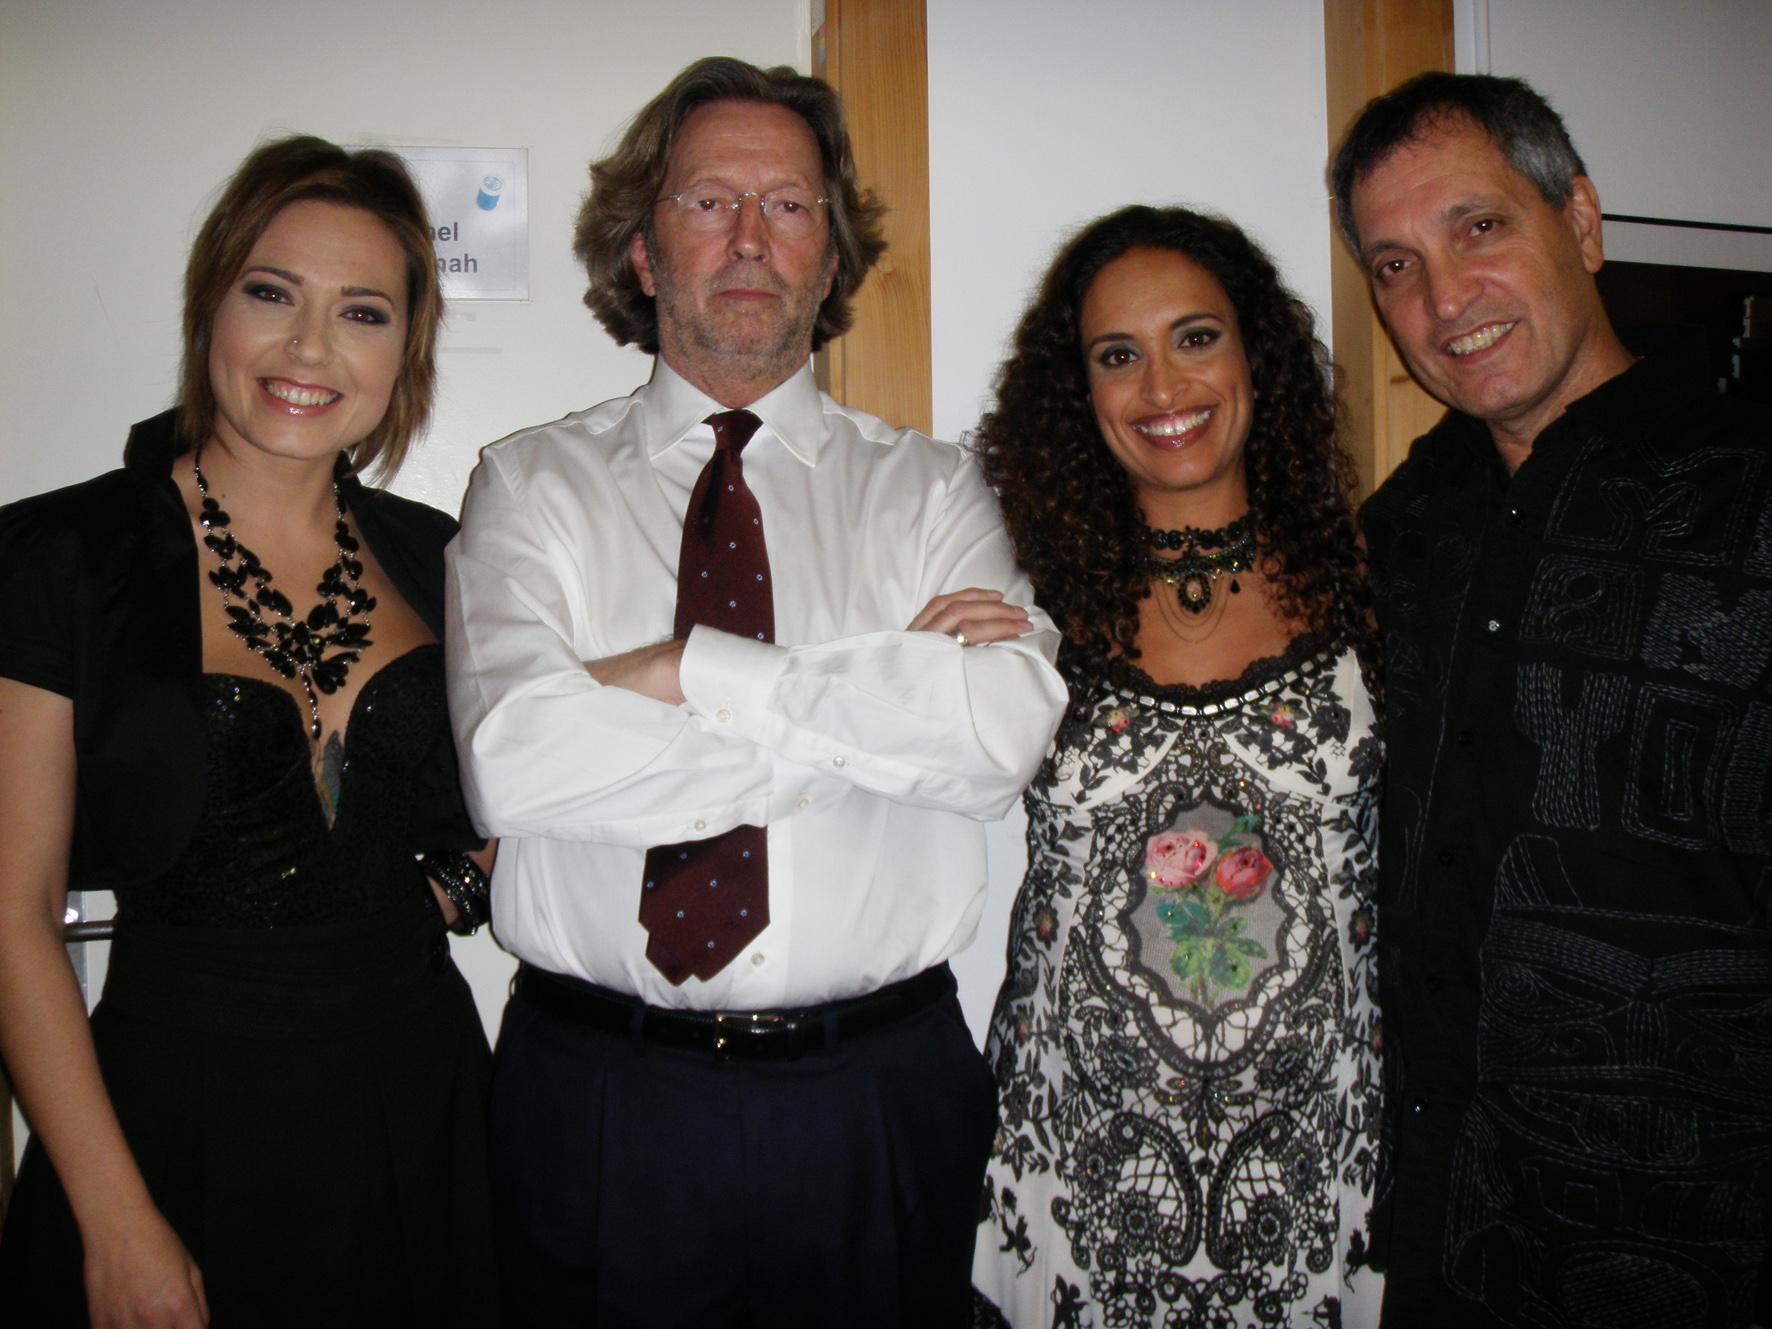 Mira Awad,Eric Clapton,Noa,Gil Dor